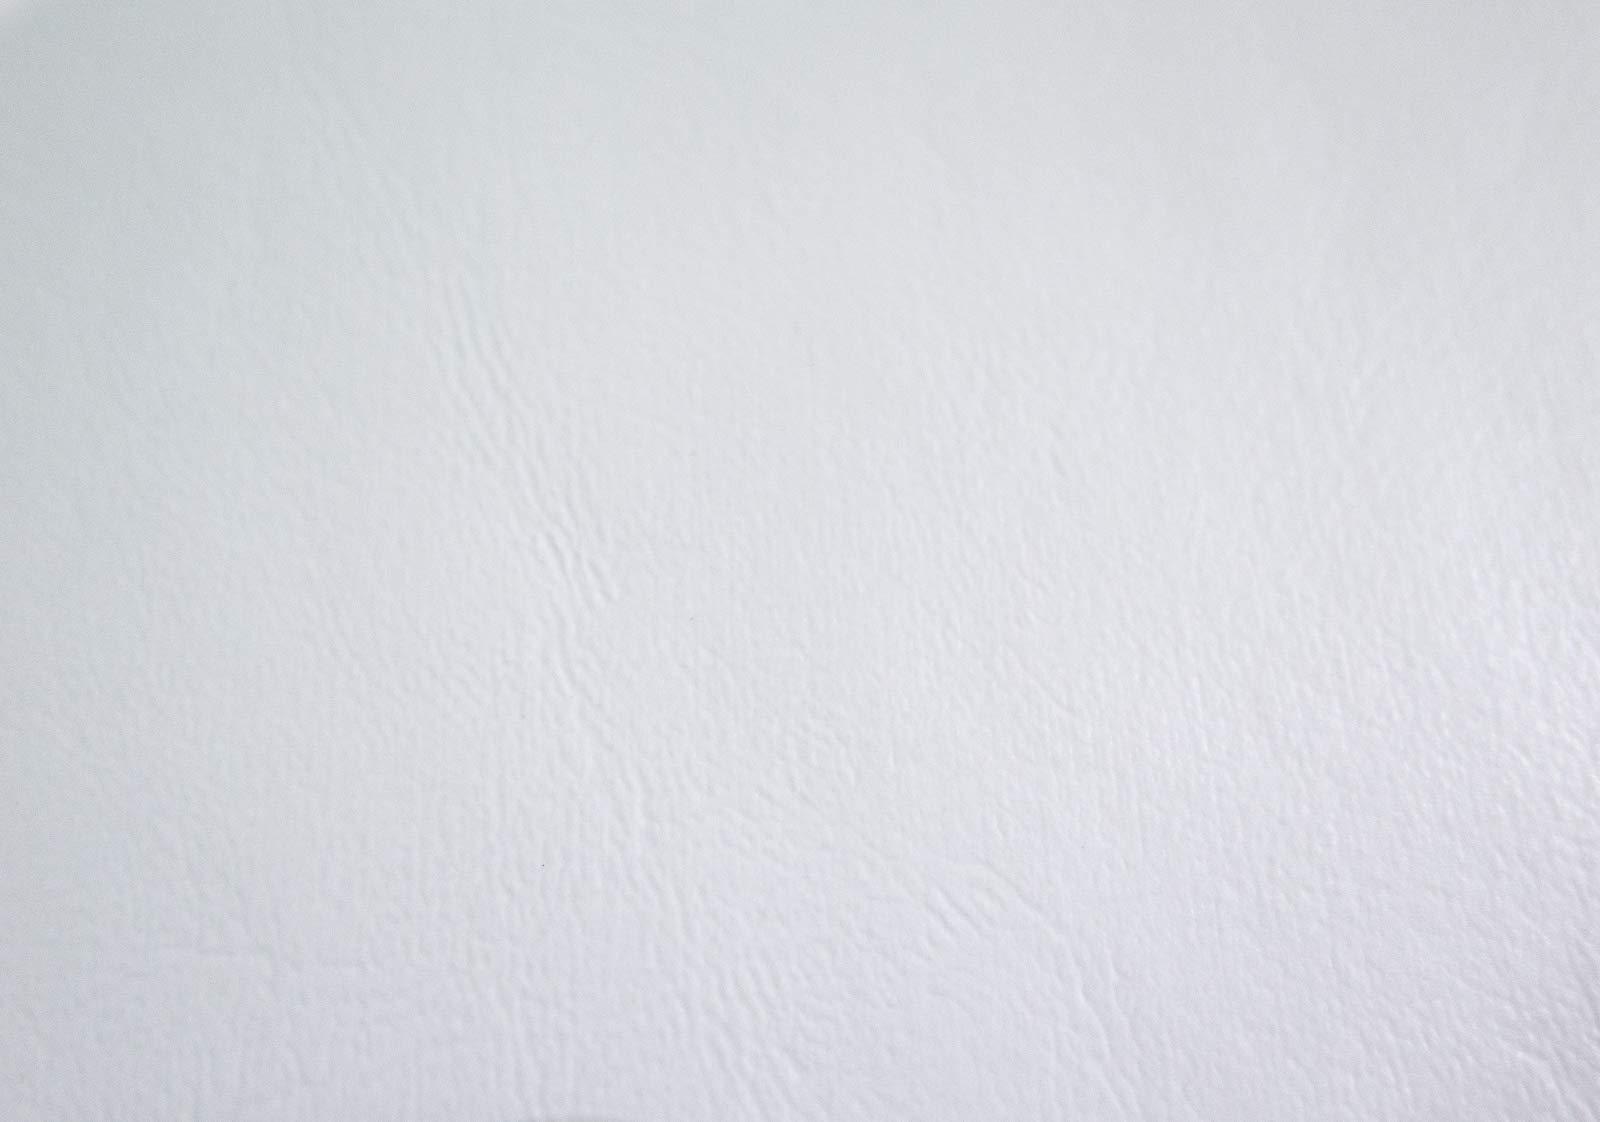 Bry-Tech Marine1 Marine Vinyl Upholstery Fabric Bright White 54'' Wide by 10 Yards Boat Auto by Bry-Tech Marine1 (Image #2)